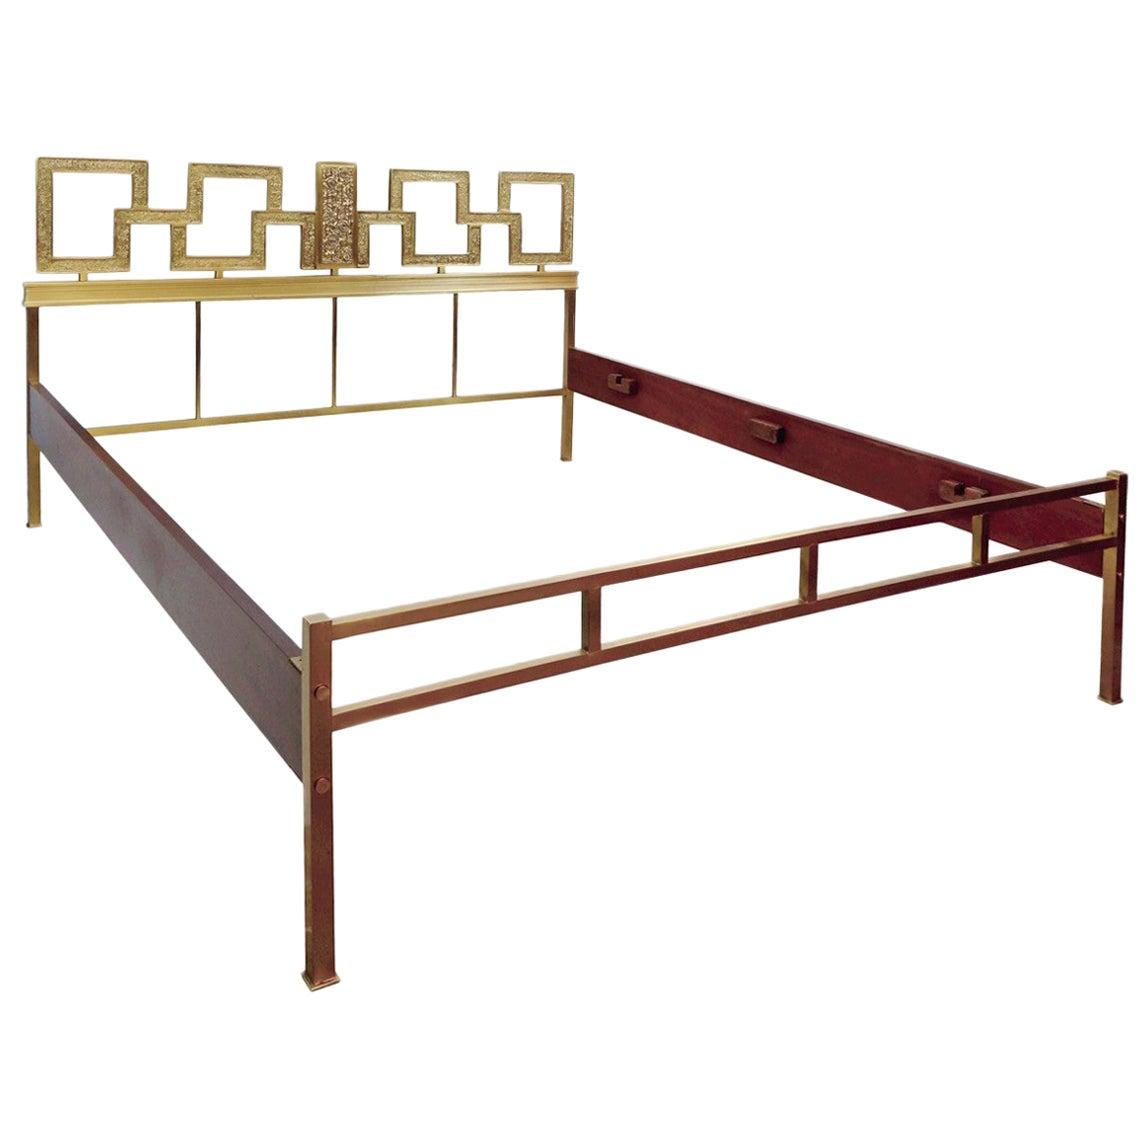 Italian Brass Double Bed, 1960s